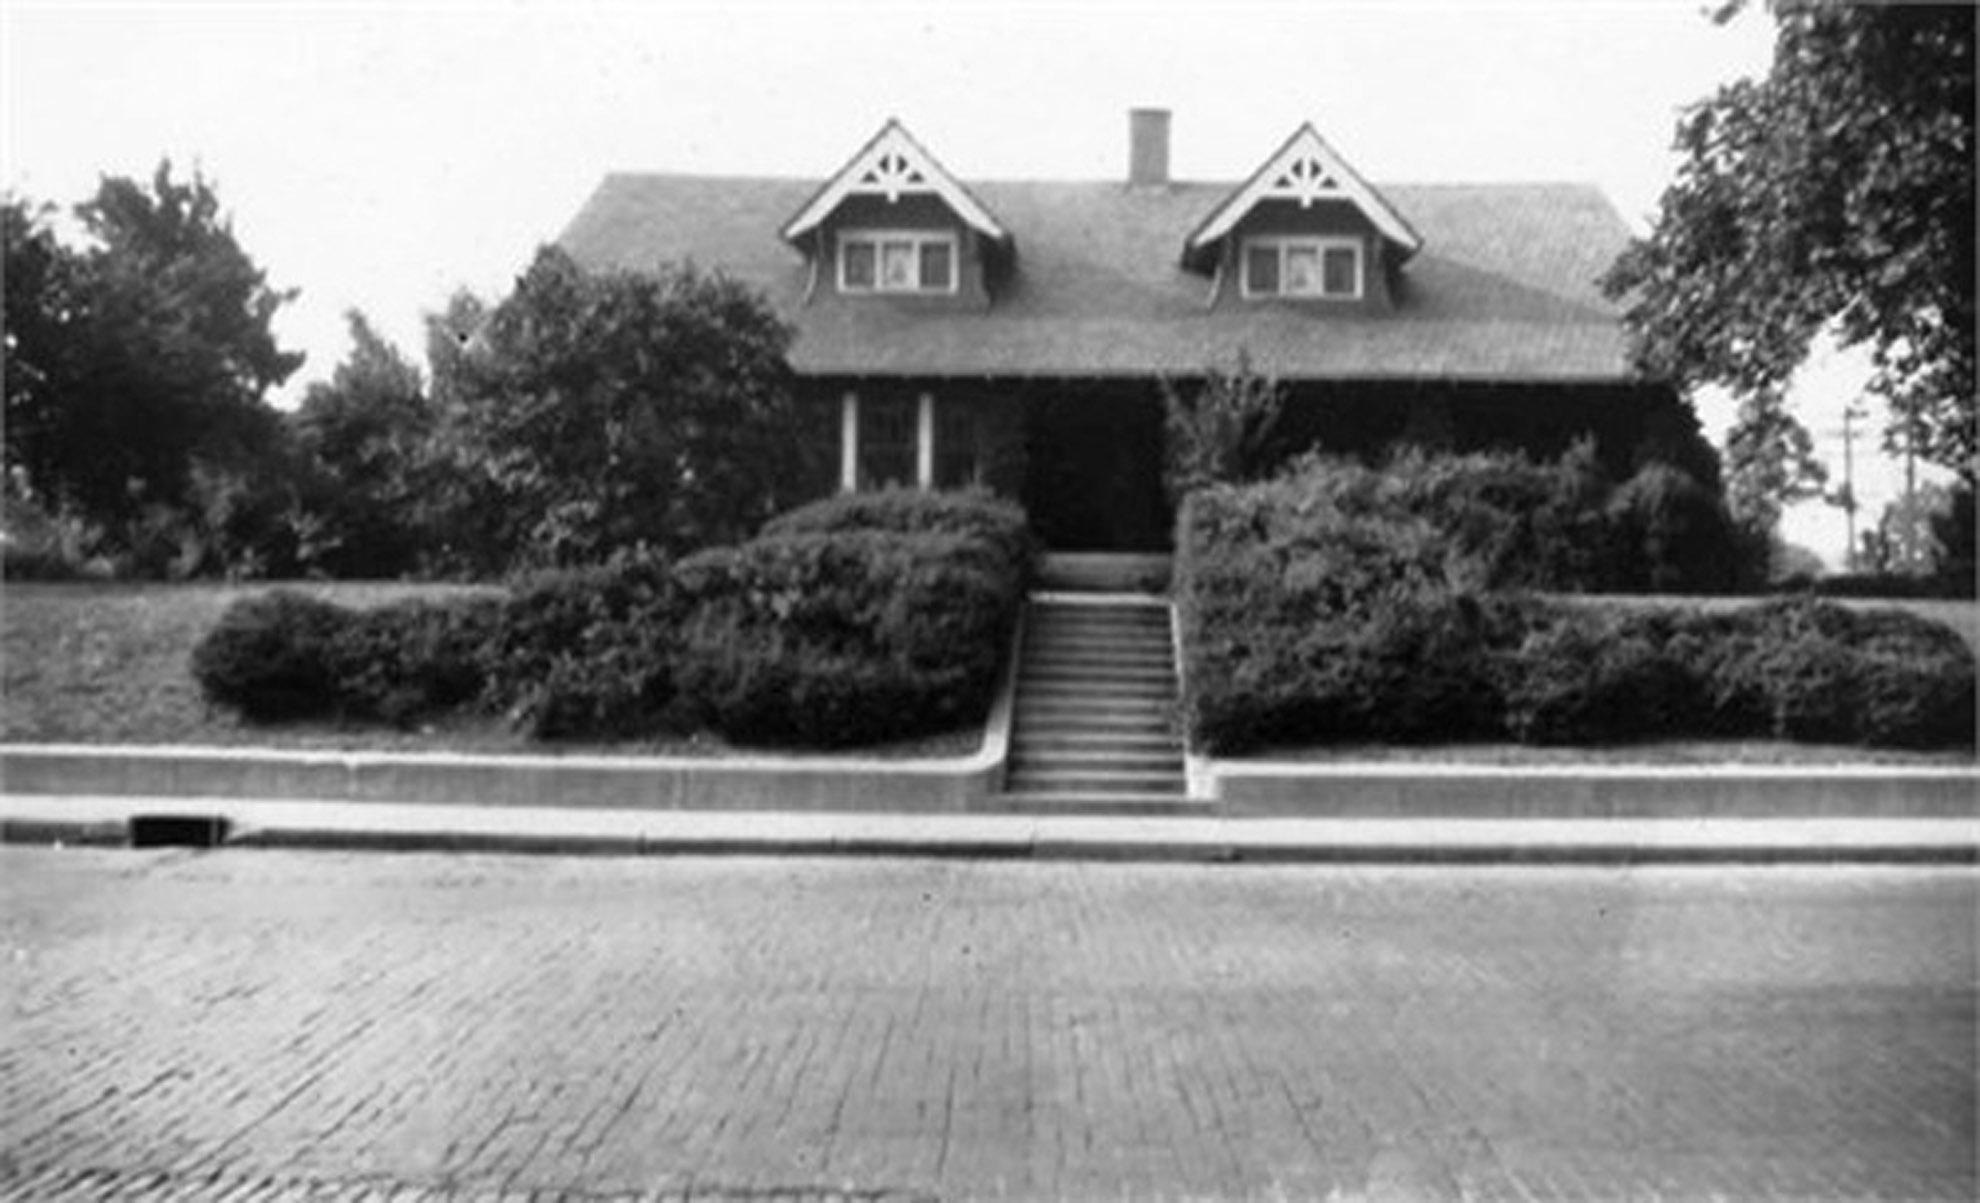 HI Mailbag:  The Lohrmann Residence